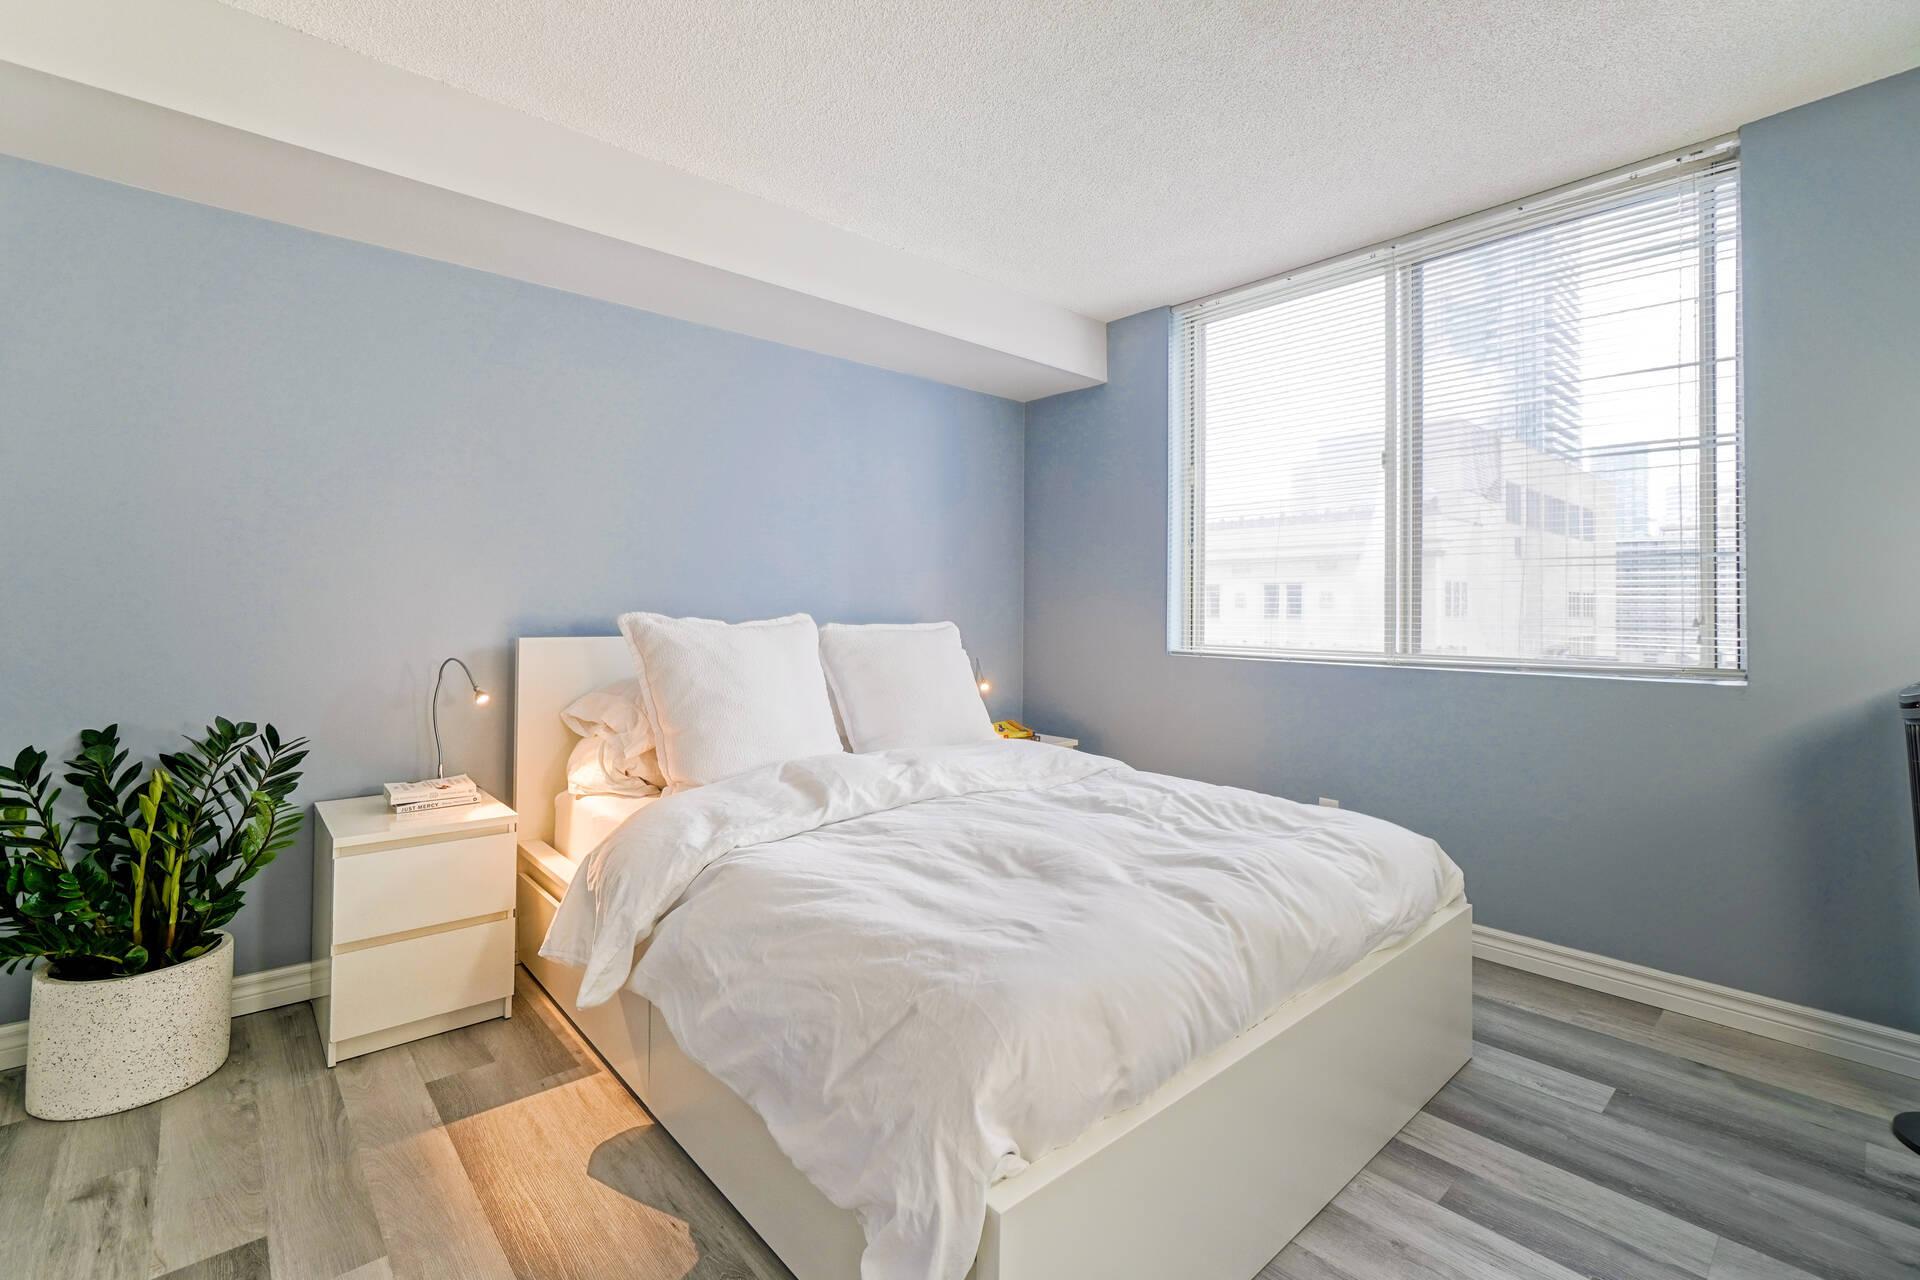 1 Bedroom plus Solarium Downtown Toronto Condo For Sale